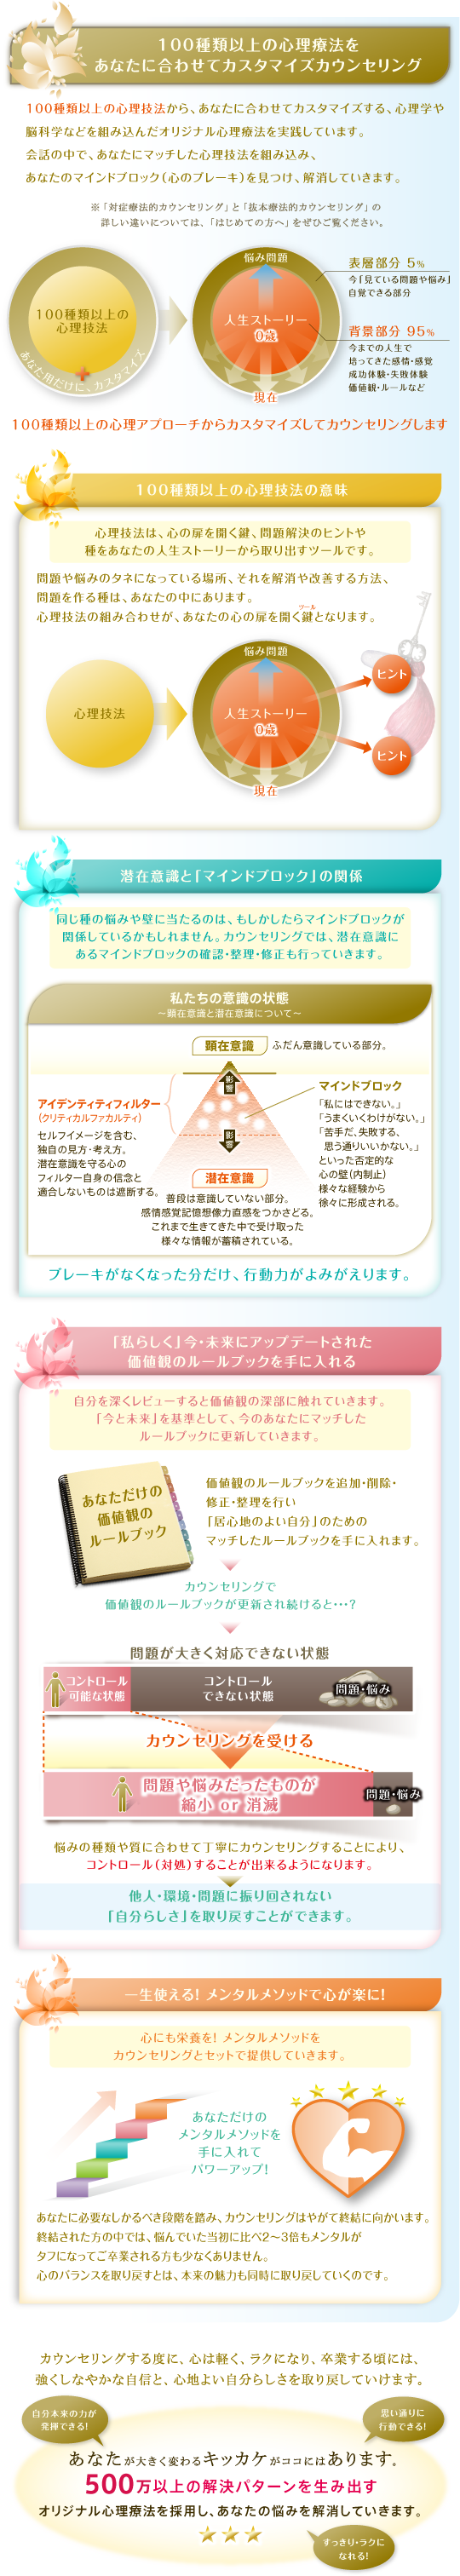 tokyo_setagaya_shimokitszawa_counseling_therapy_coaching372